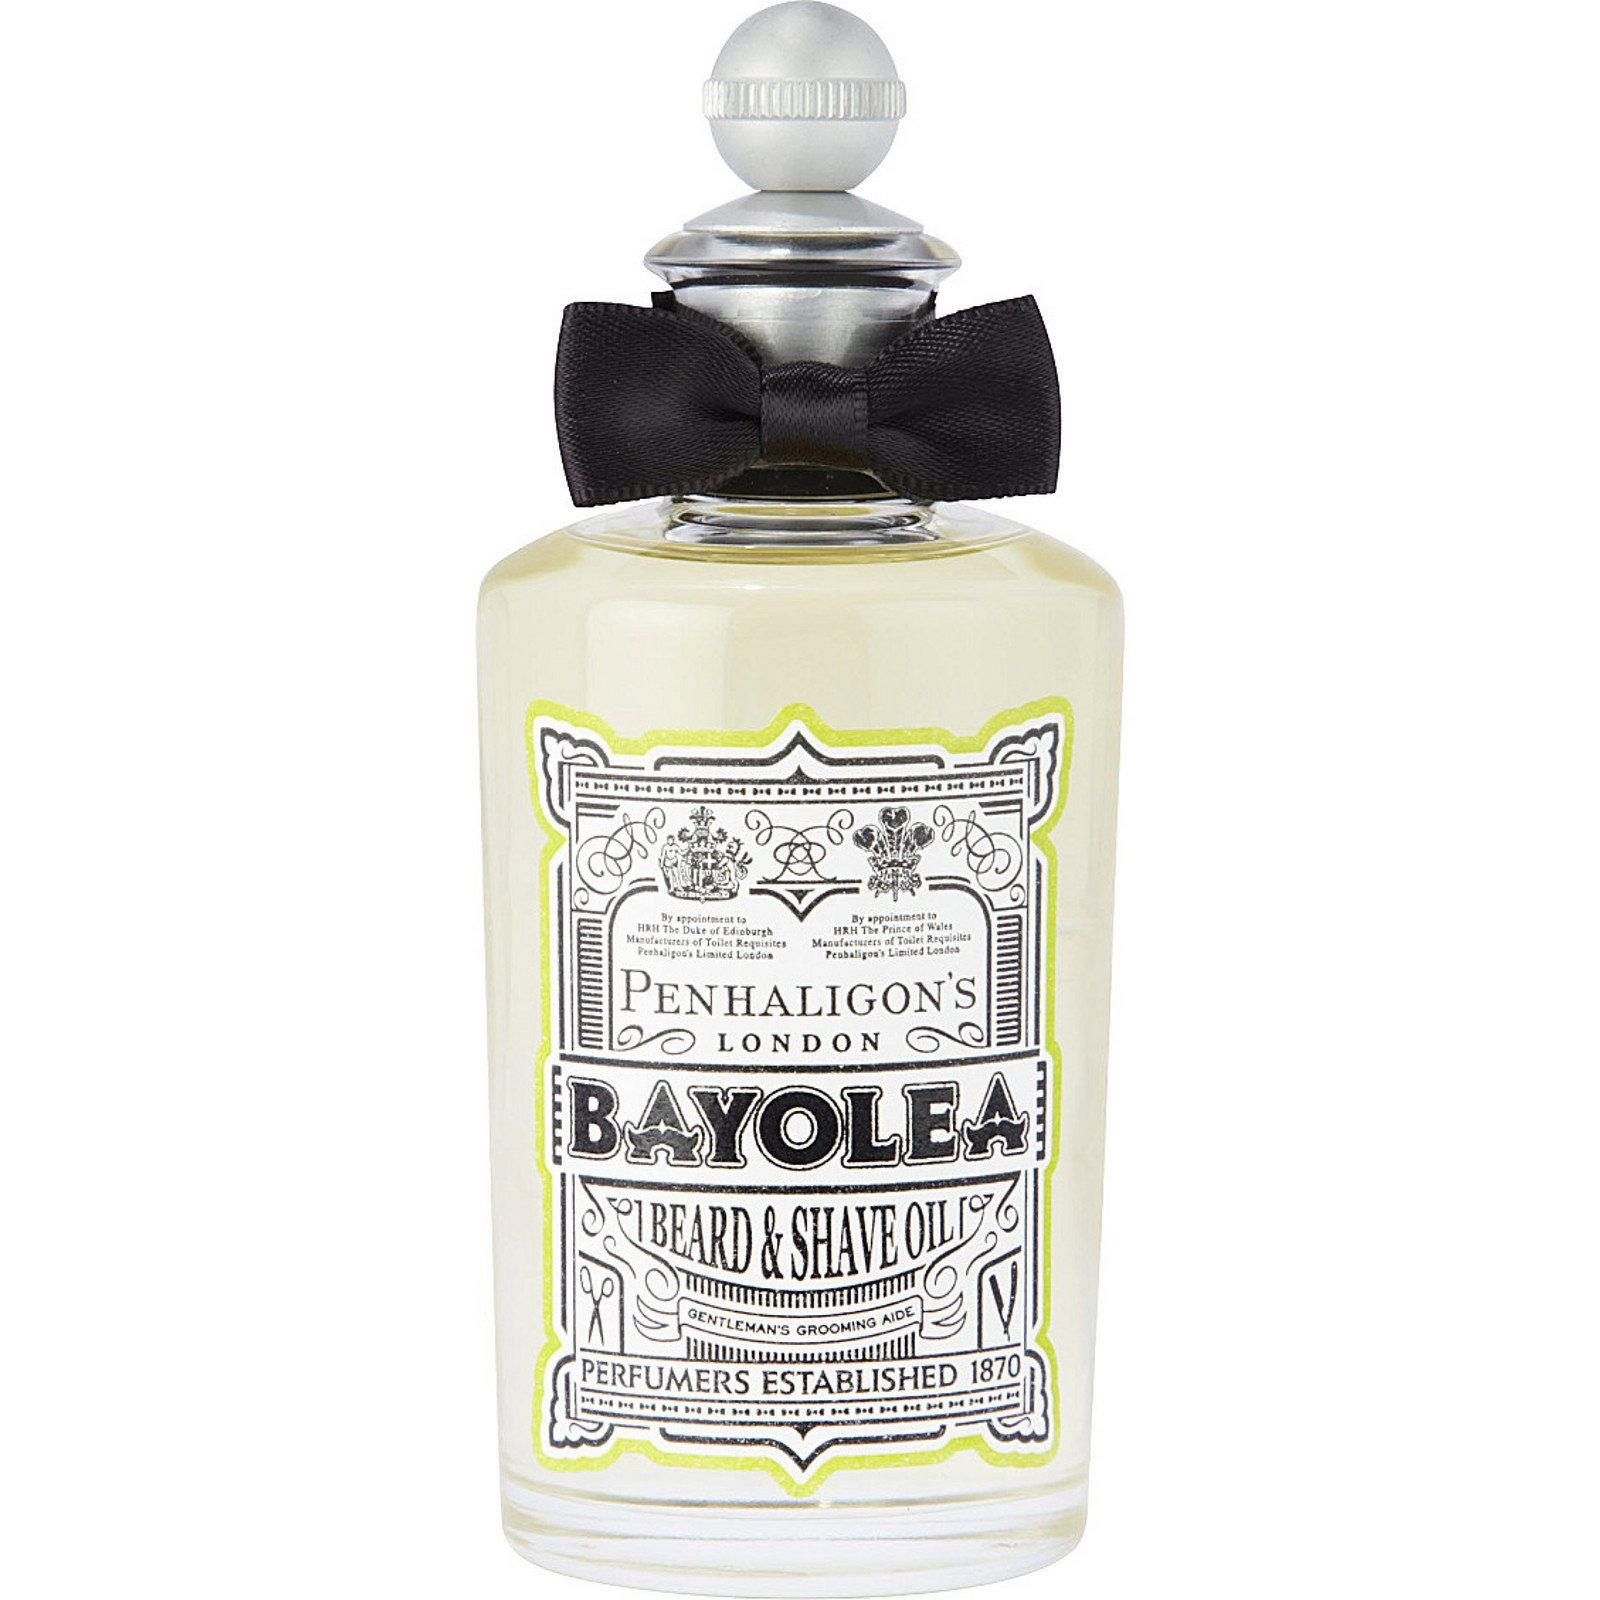 Penhaligon's Bayolea Beard & Shave Oil 100ml/3.4oz